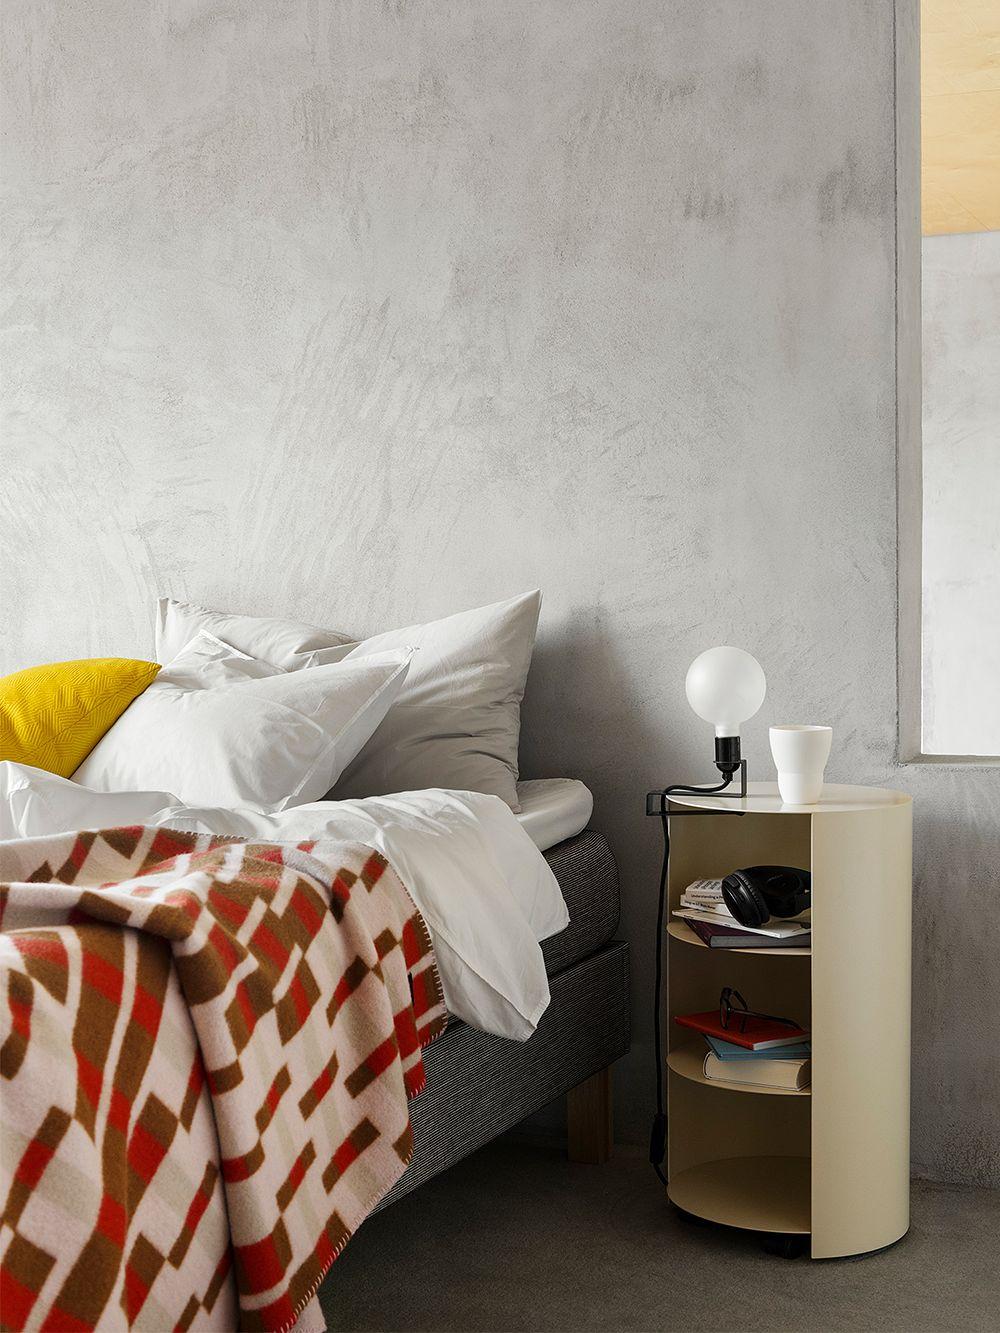 Hem's Vienna throw and Hide pedestal in bedroom decor.